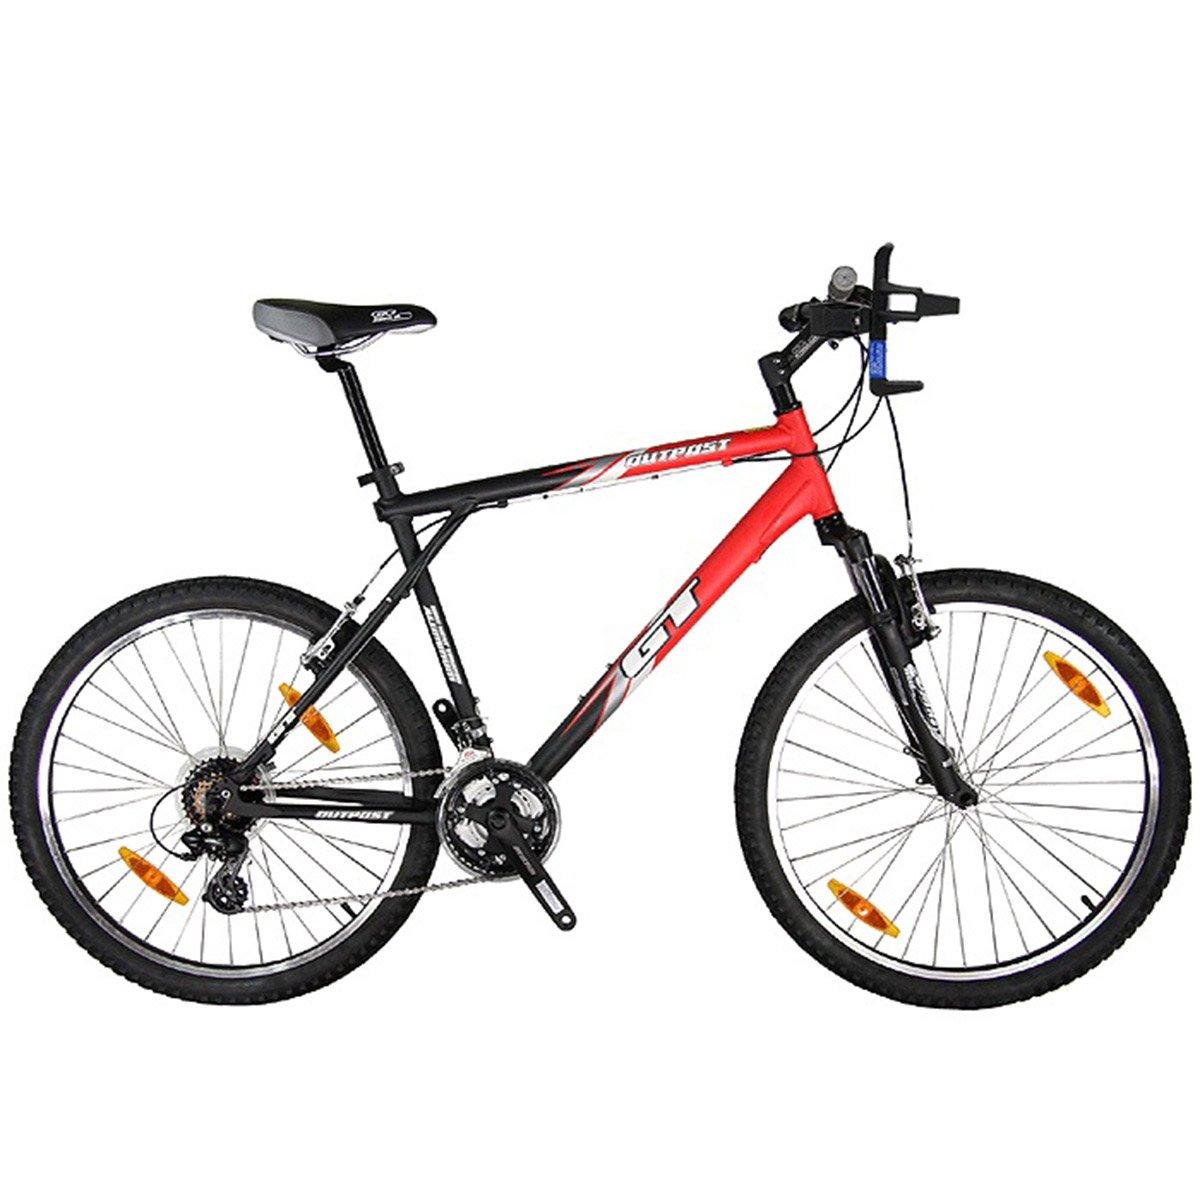 AUVSTA Soporte para silla de ruedas, ProCIV Soporte para vaso de bicicleta para cochecito de bebé, 360 grados universal cochecito de bicicleta, ...